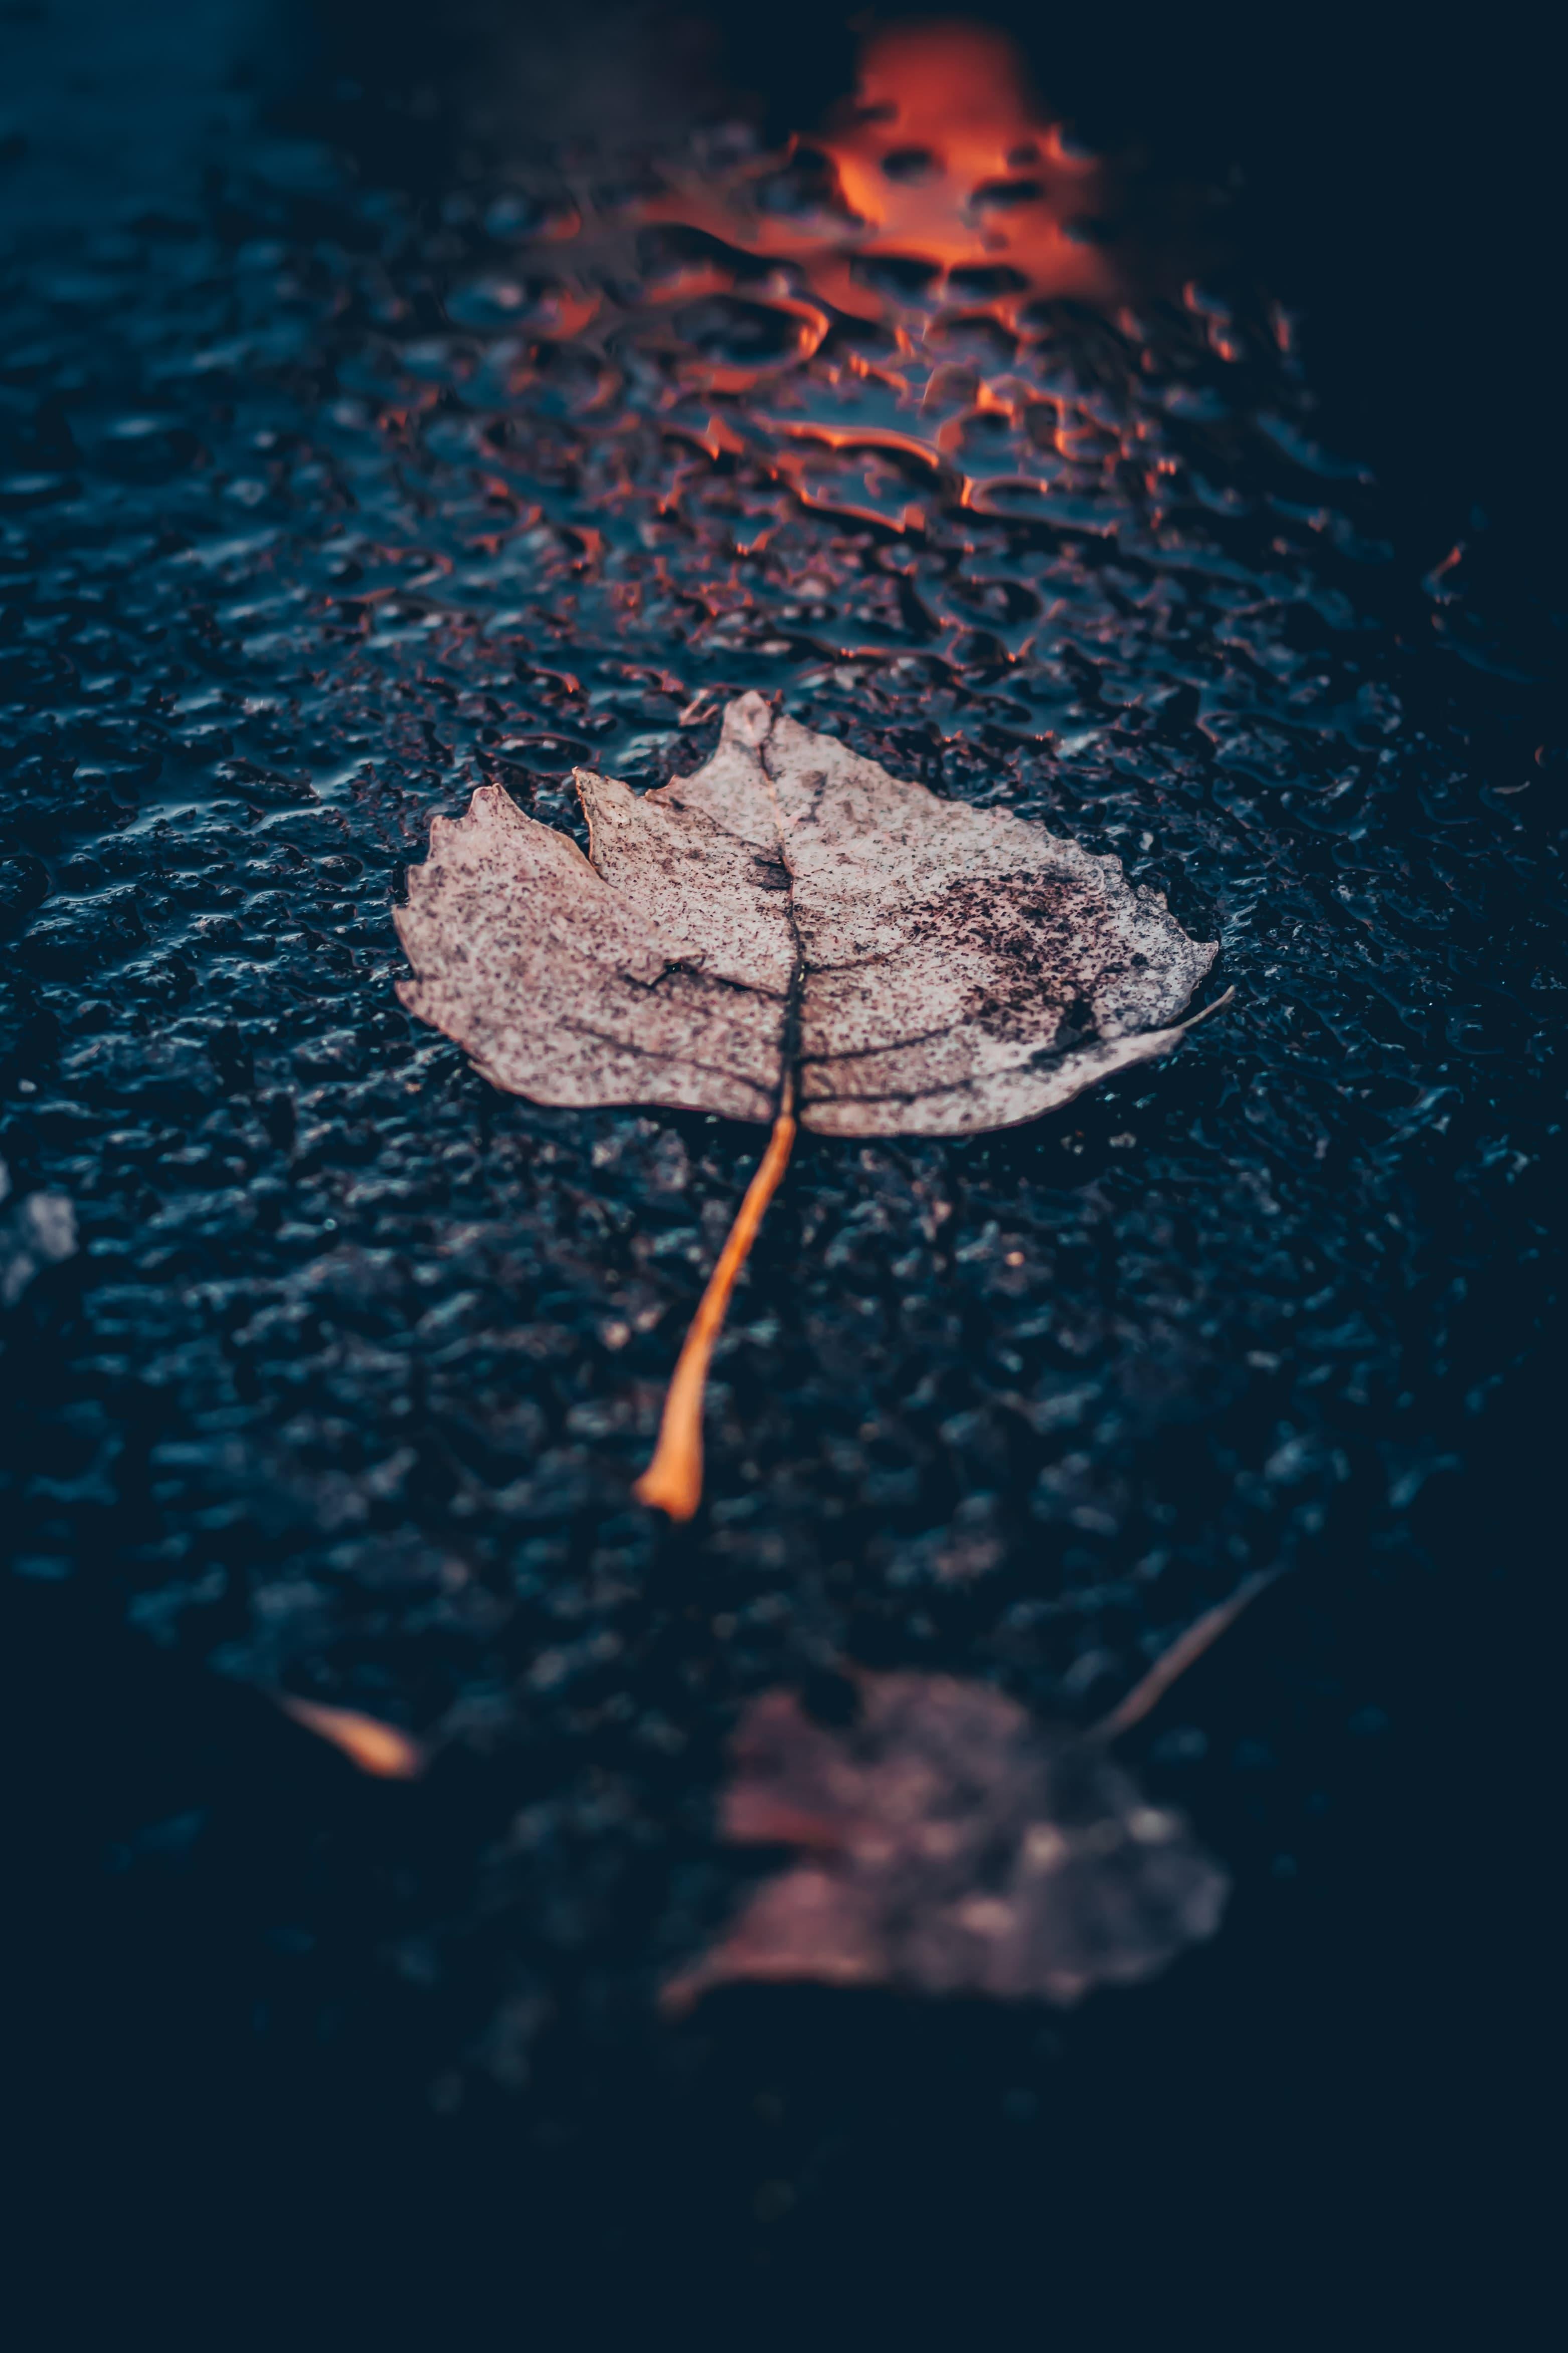 leaf floating on rain water